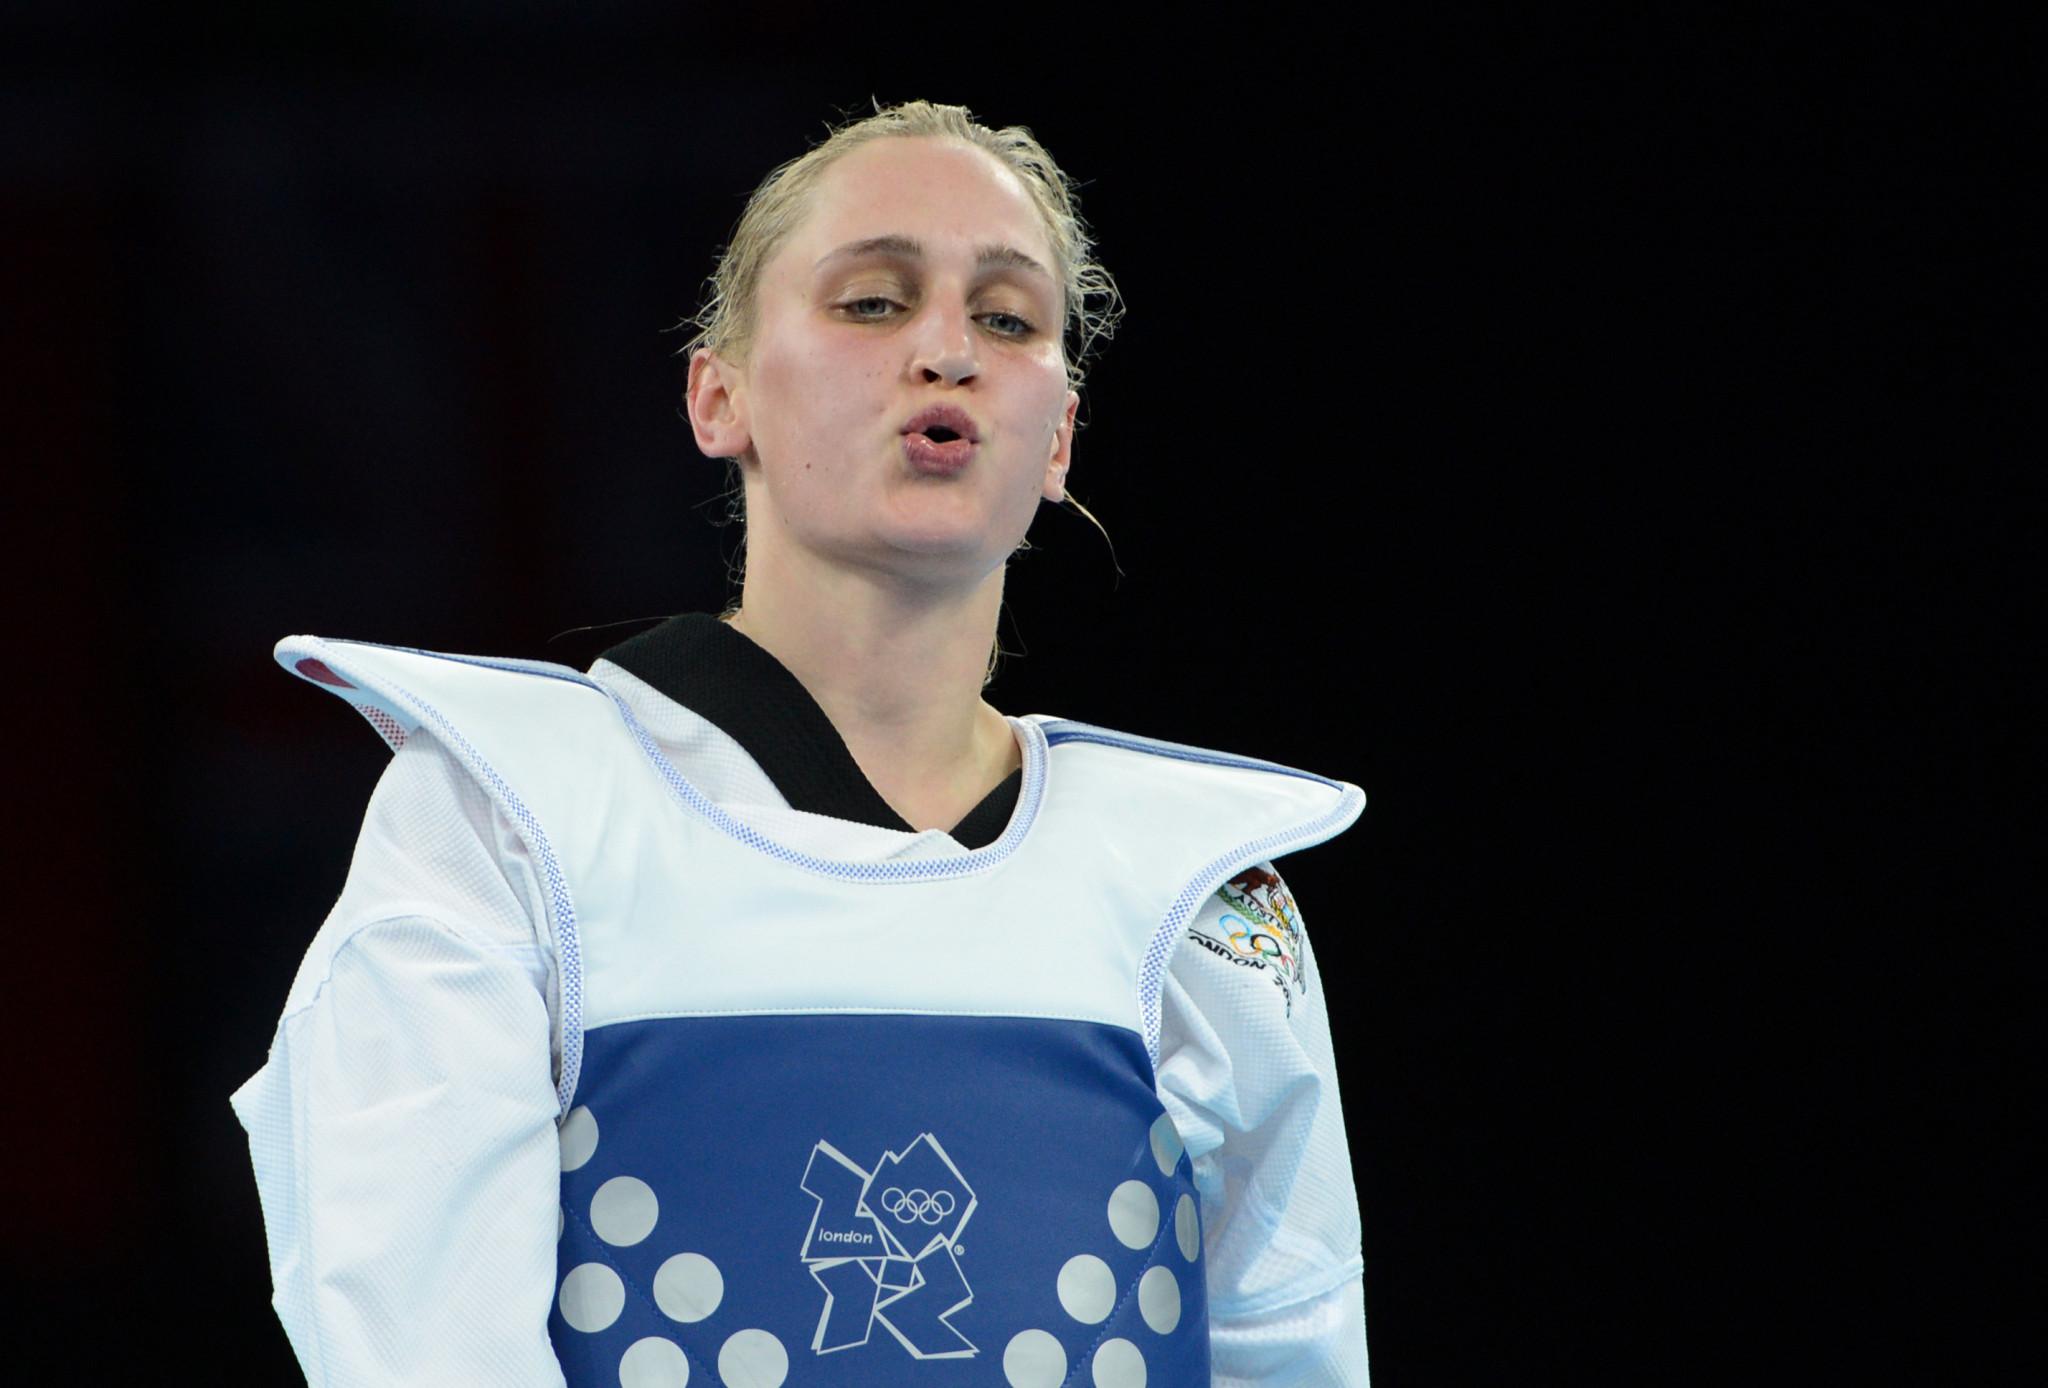 Carmen Marton won World Championship gold for Australia in 2013 ©Getty Images